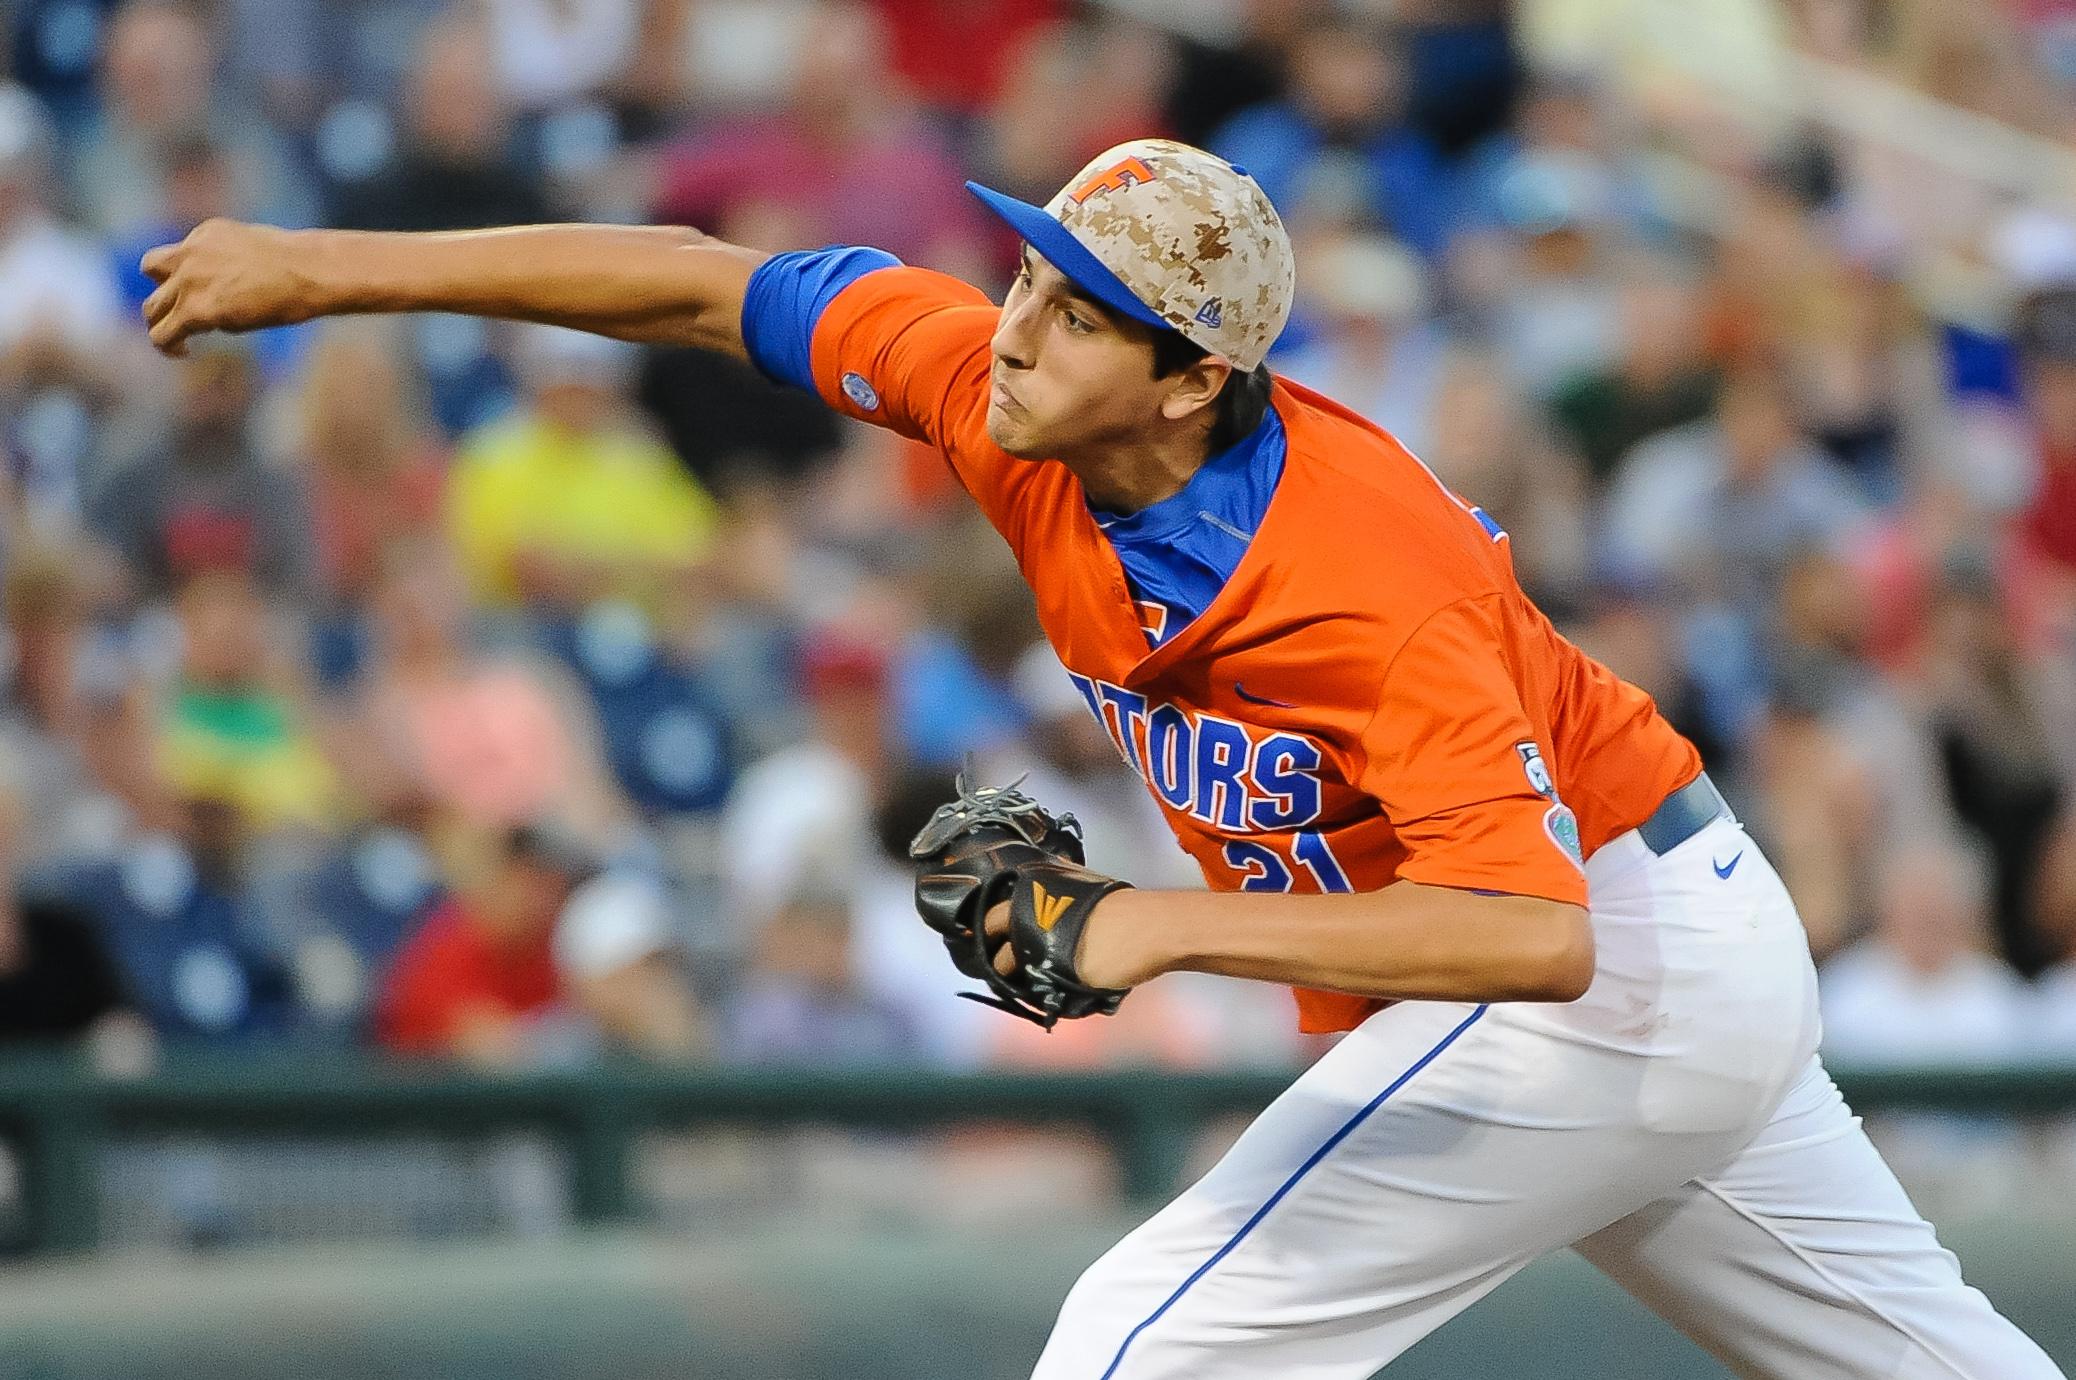 8642369-ncaa-baseball-college-world-series-florida-vs-miami-1